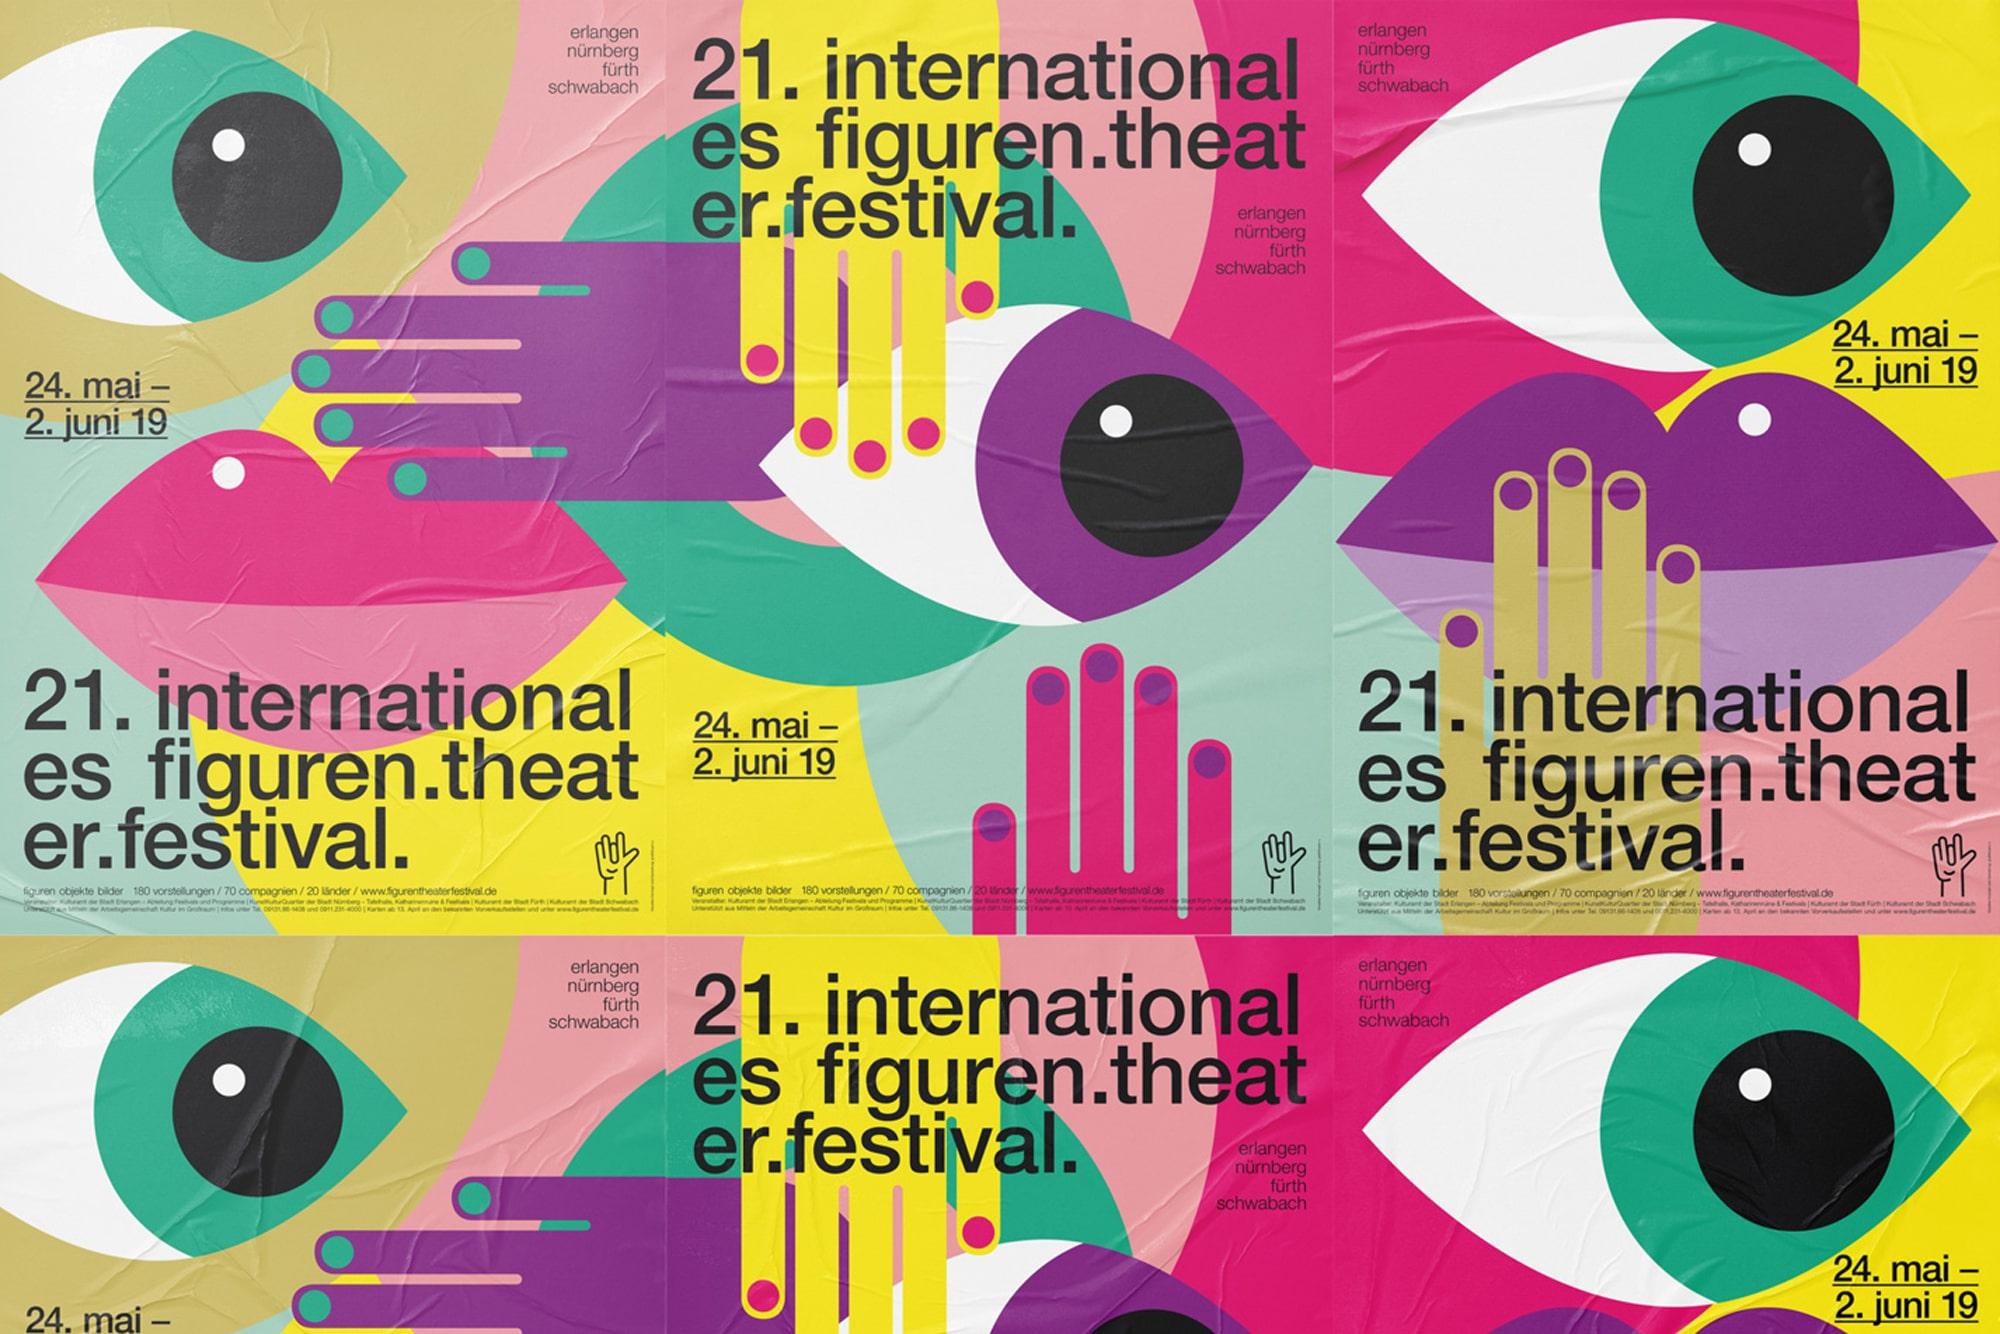 first-planx-internationales.figuren.theater.festival-Plakate3c